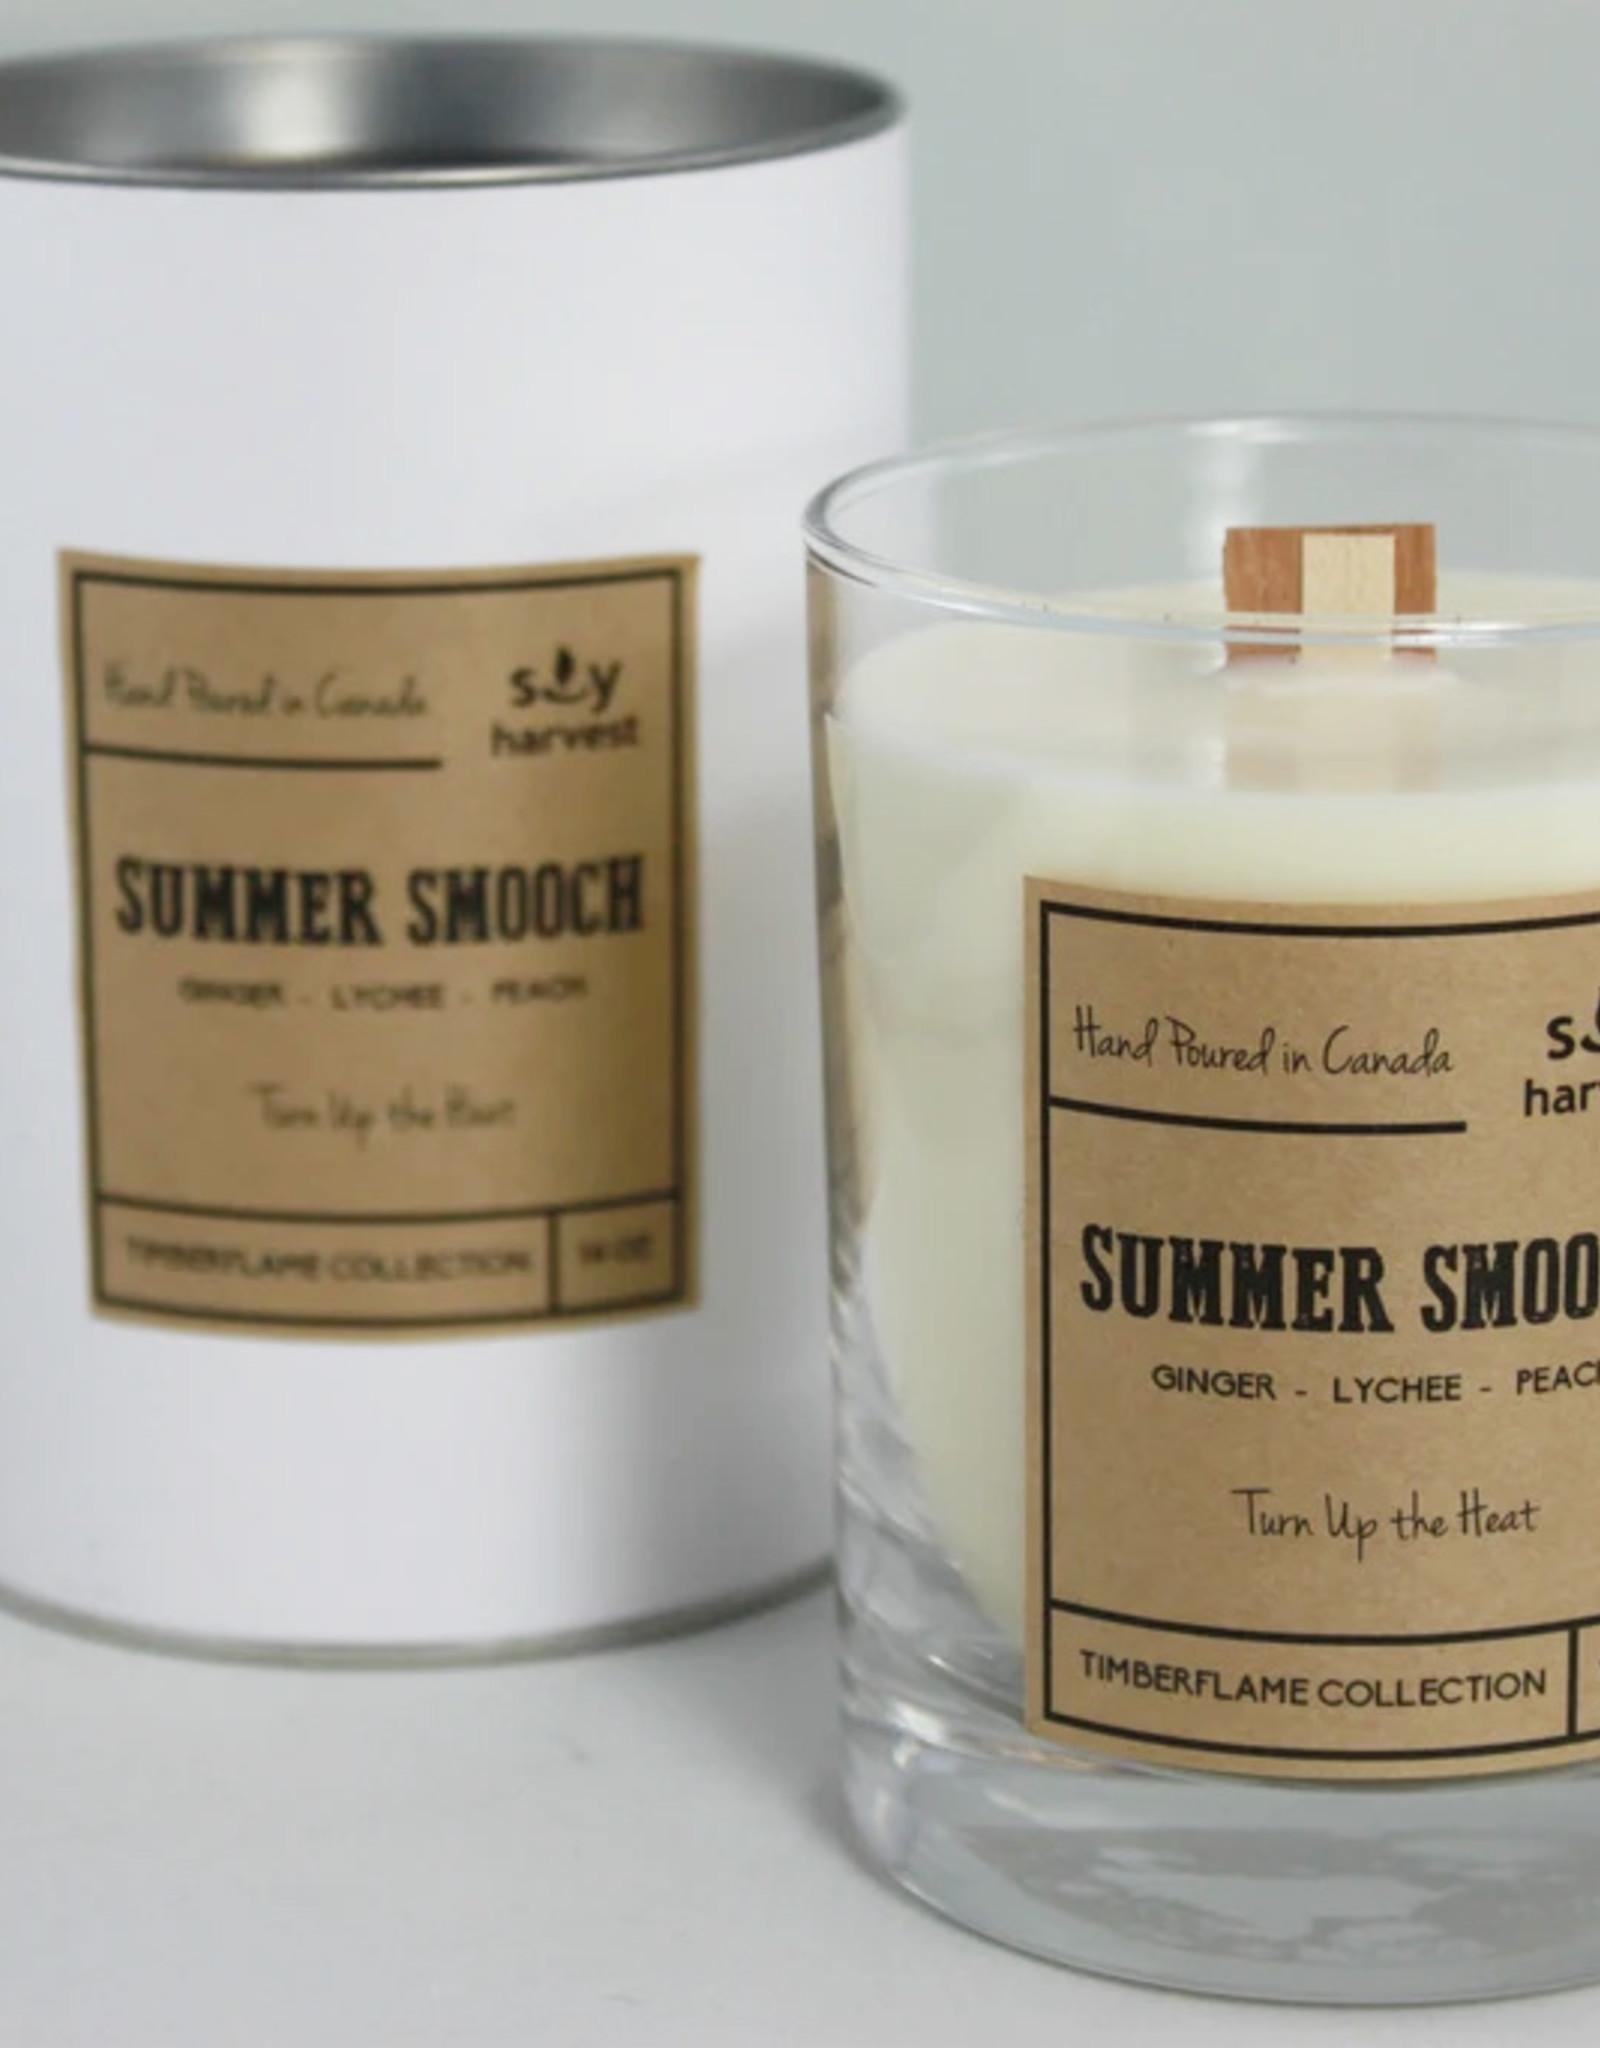 Summer Smooch Soy Candle